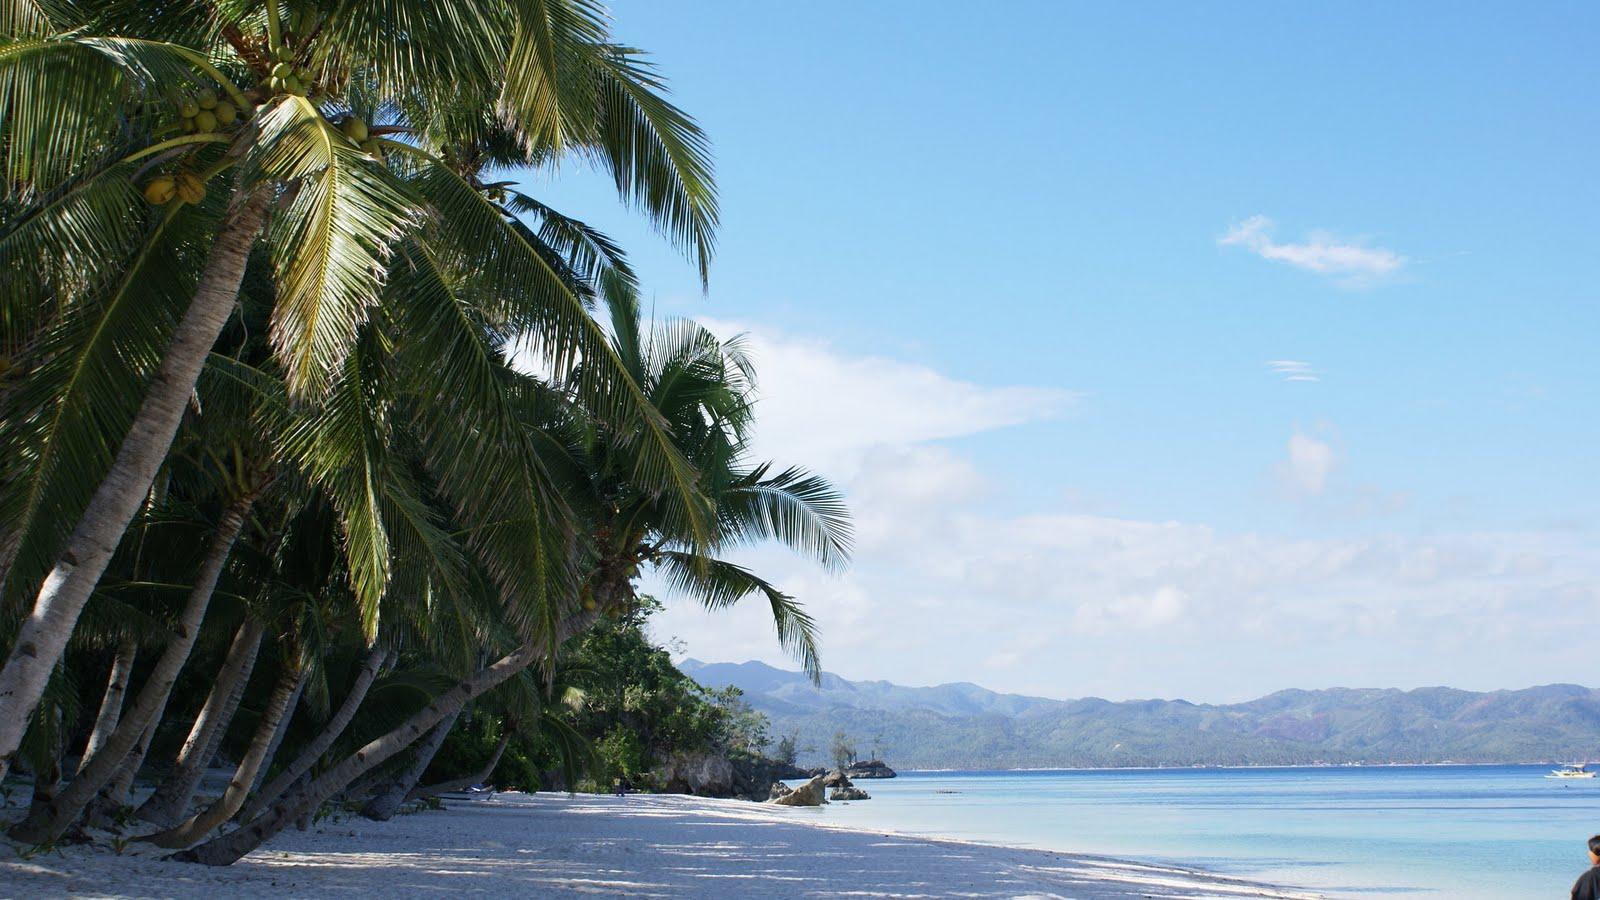 FULL WALLPAPER: Original high resolution pics of beaches